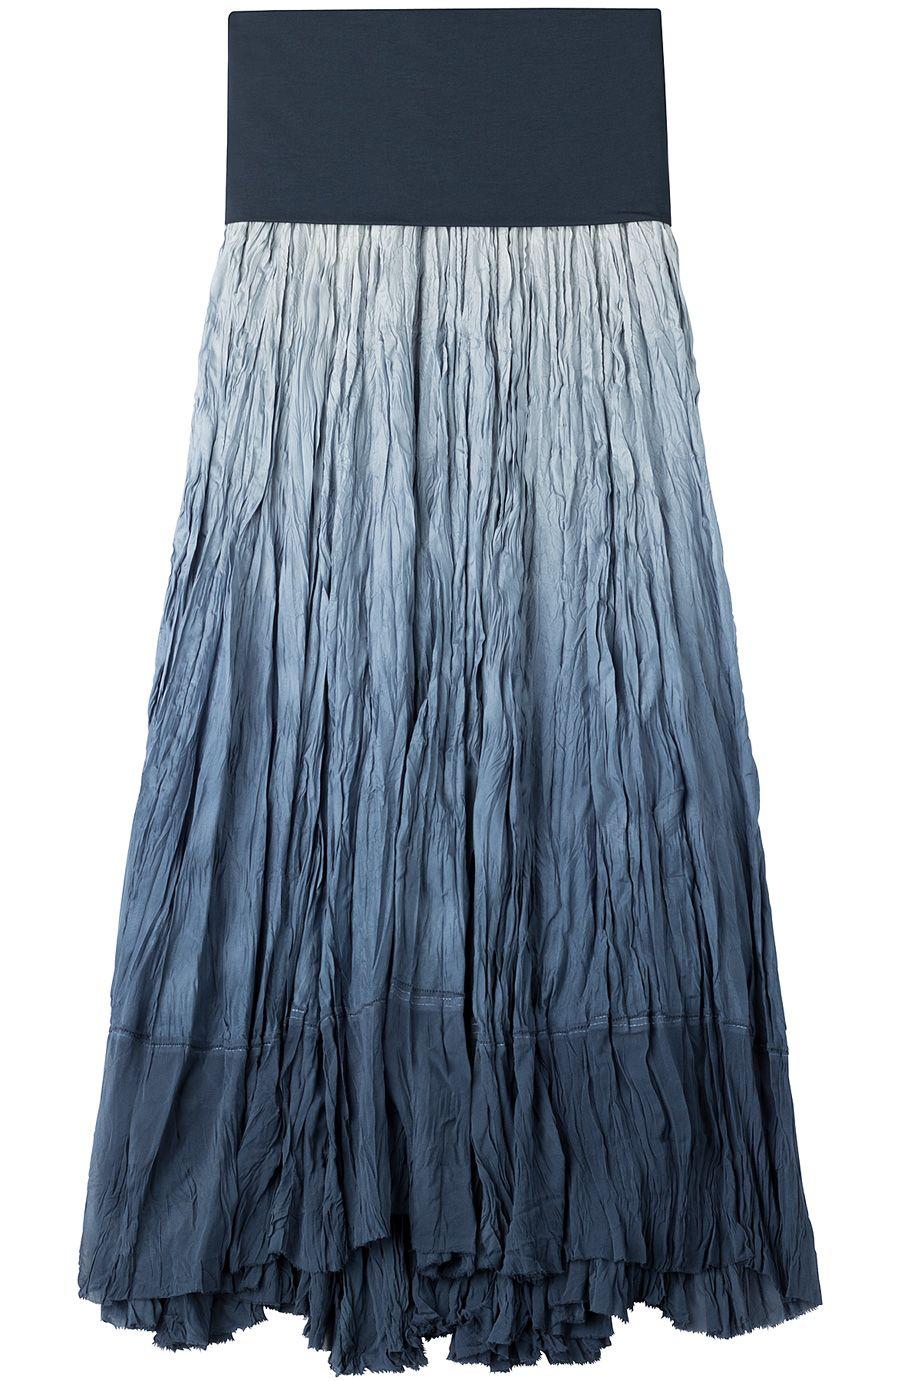 Donna Karan New York : Crinkled Silk Maxi Skirt || StyleBop | Mini ...